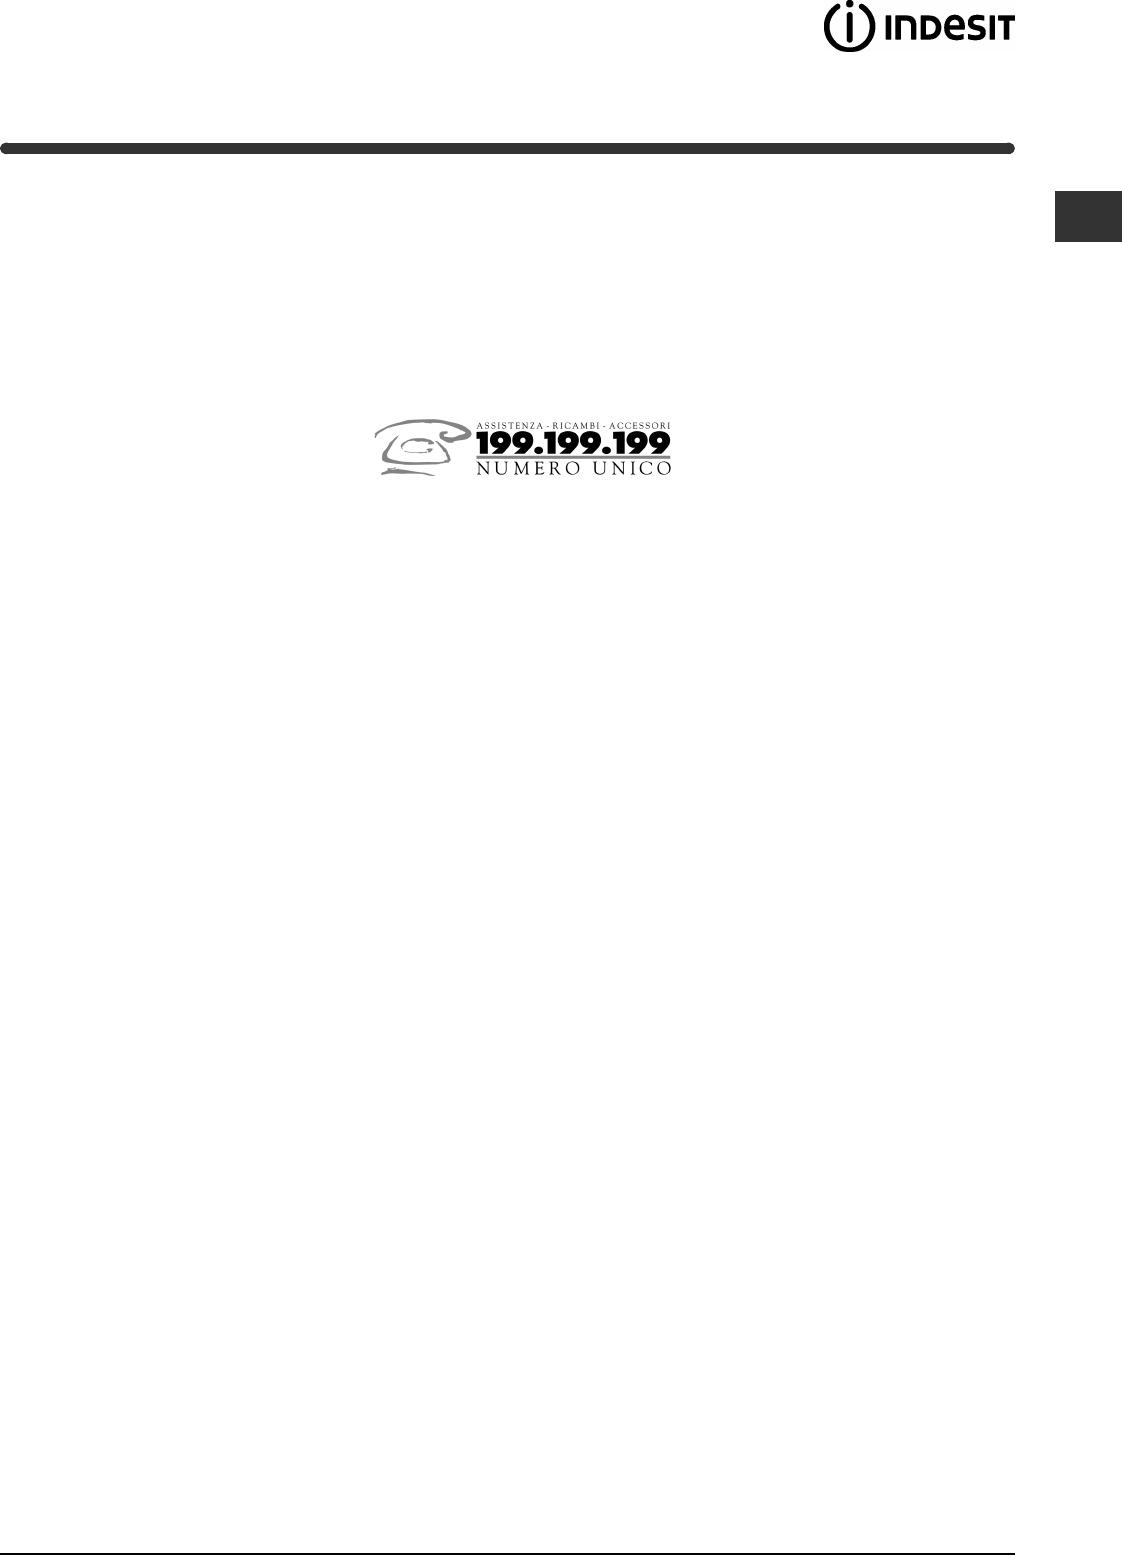 Handleiding Indesit FI 20.B IX (pagina 11 van 72) (Nederlands)